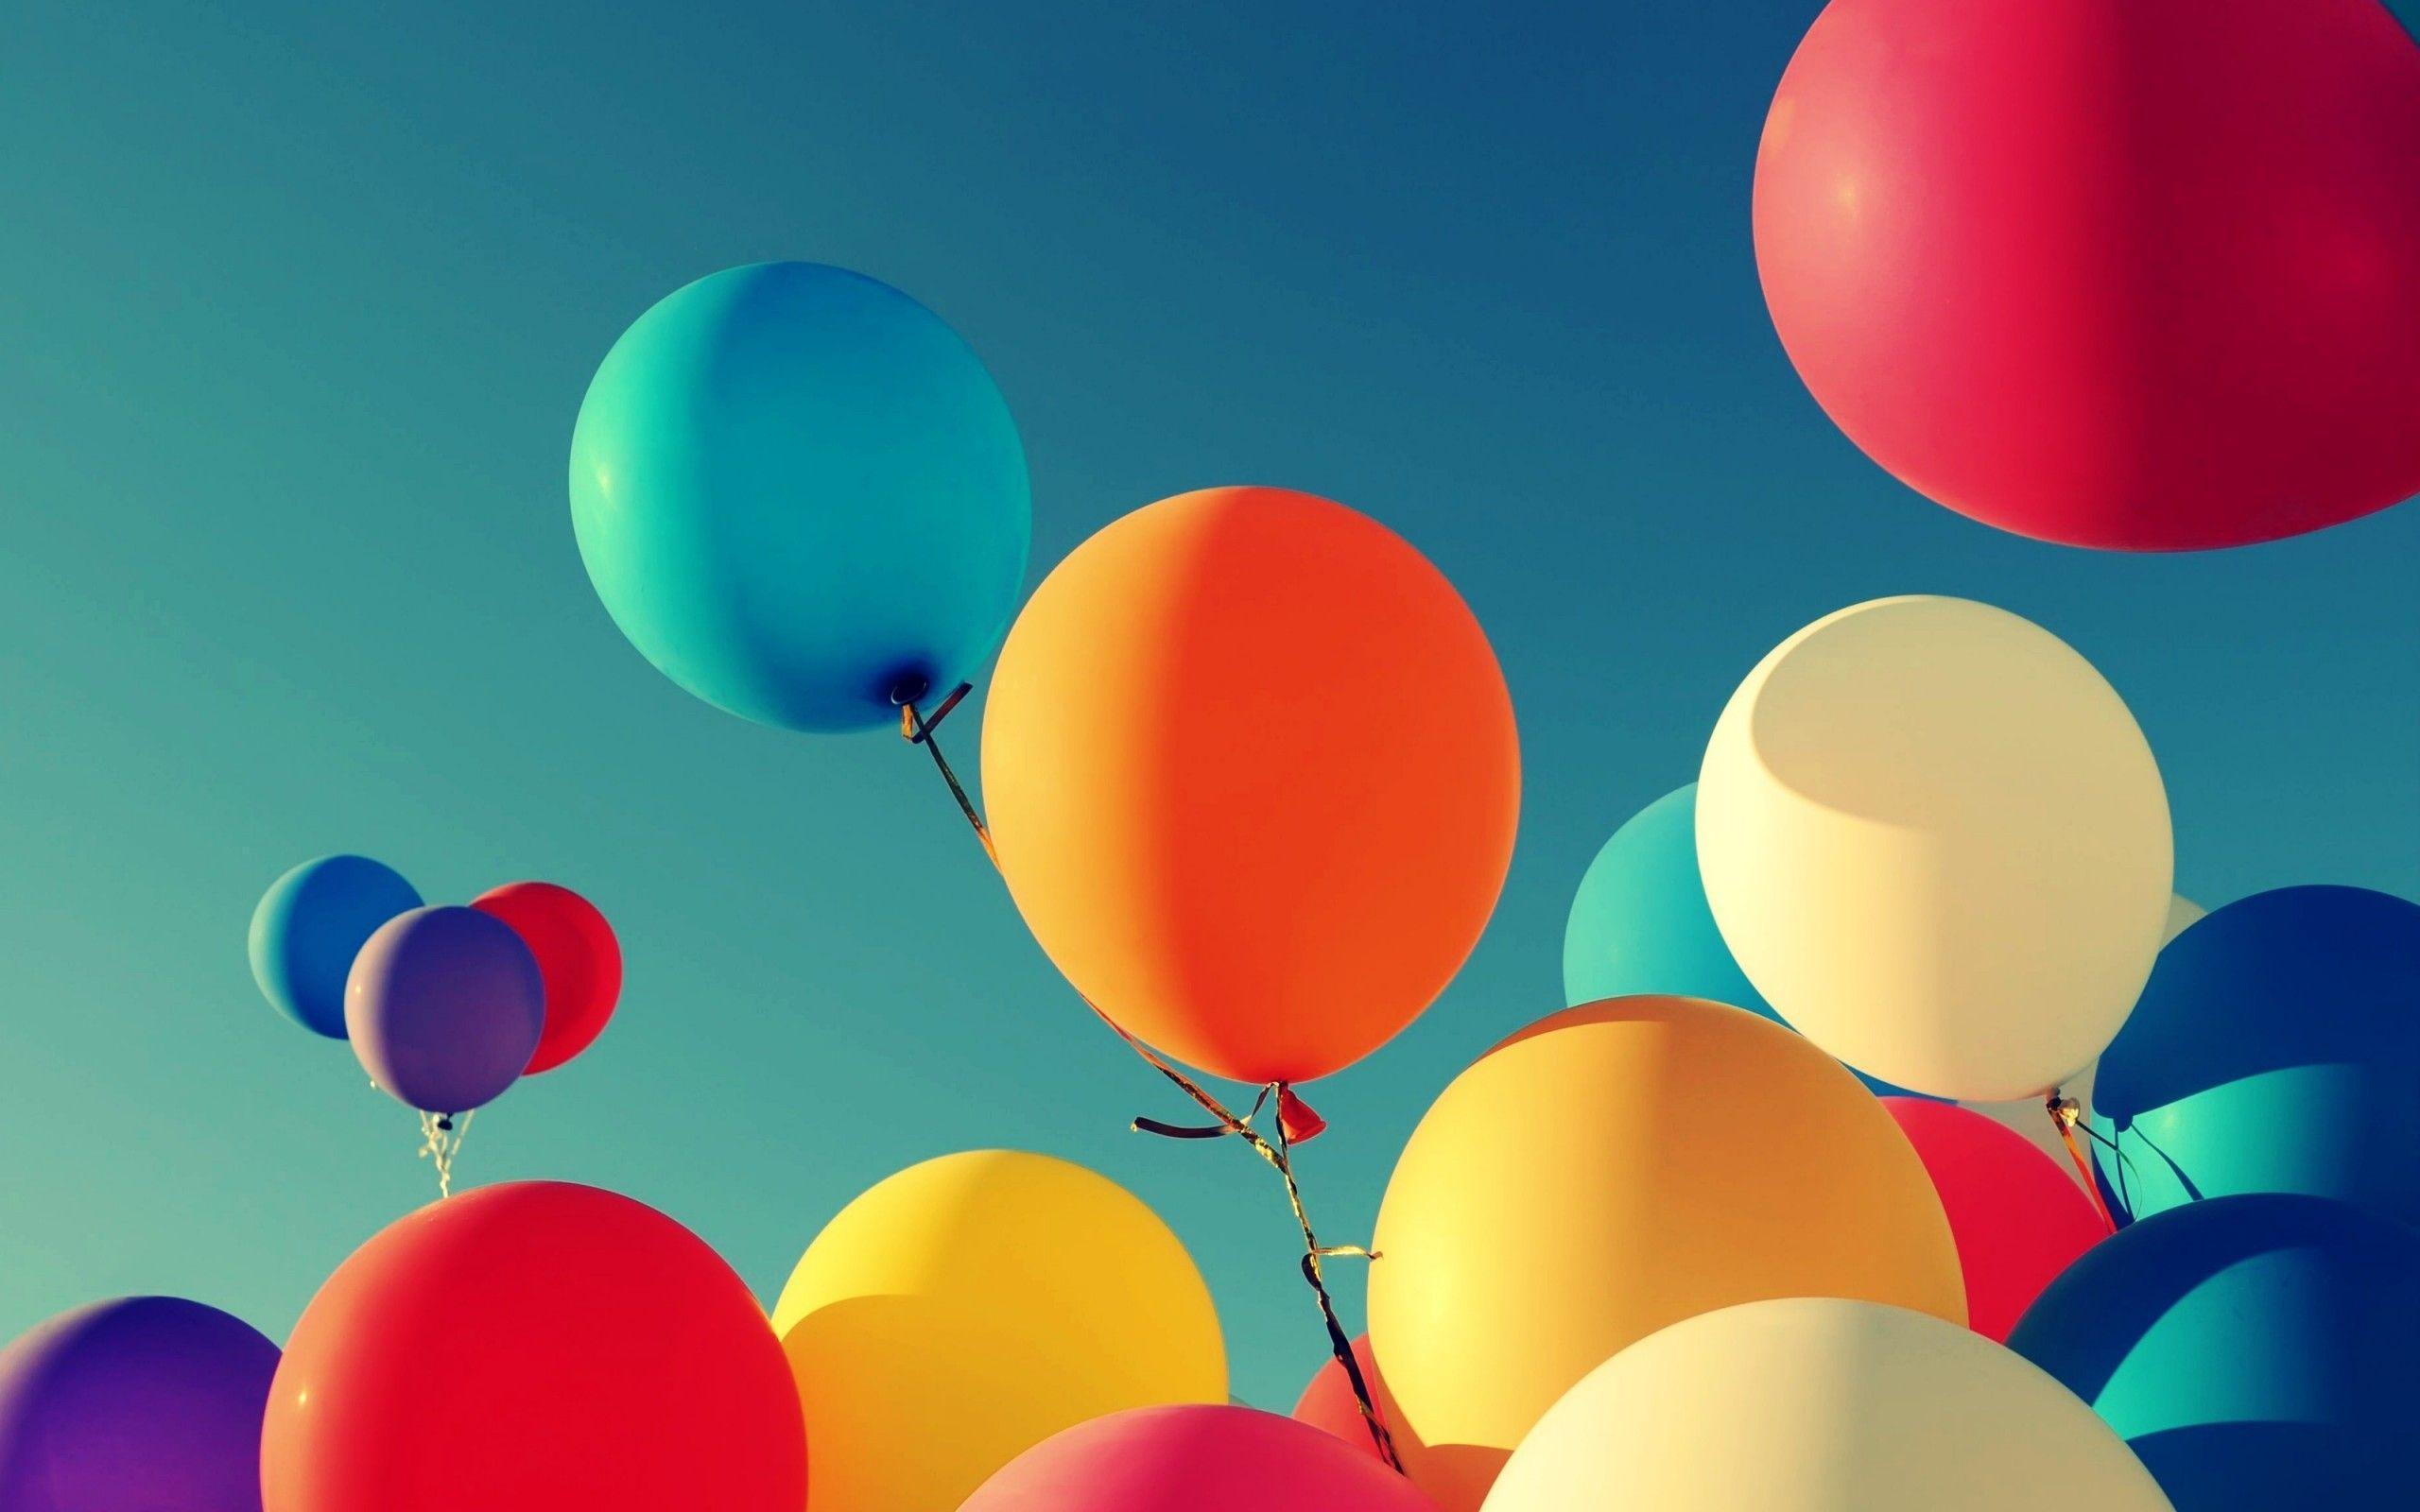 42 Balloon HD Wallpapers